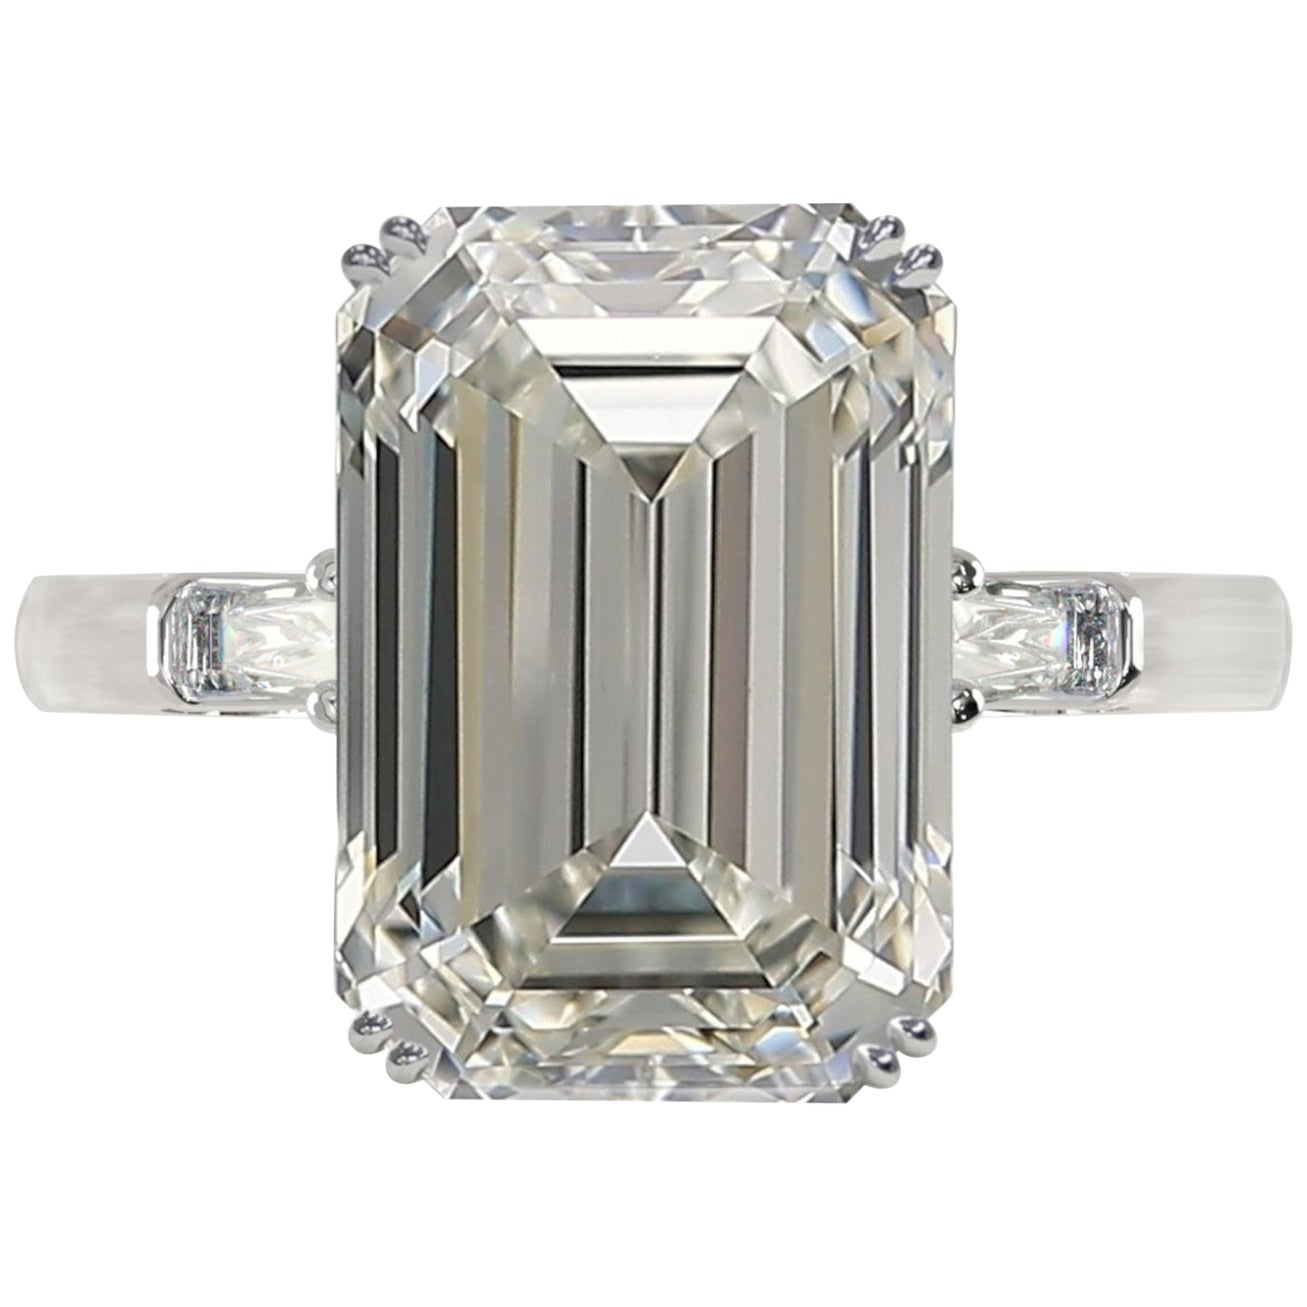 EXCEPTIONAL GIA Certified 4 Carat Emerald Cut Diamond Platinum Ring